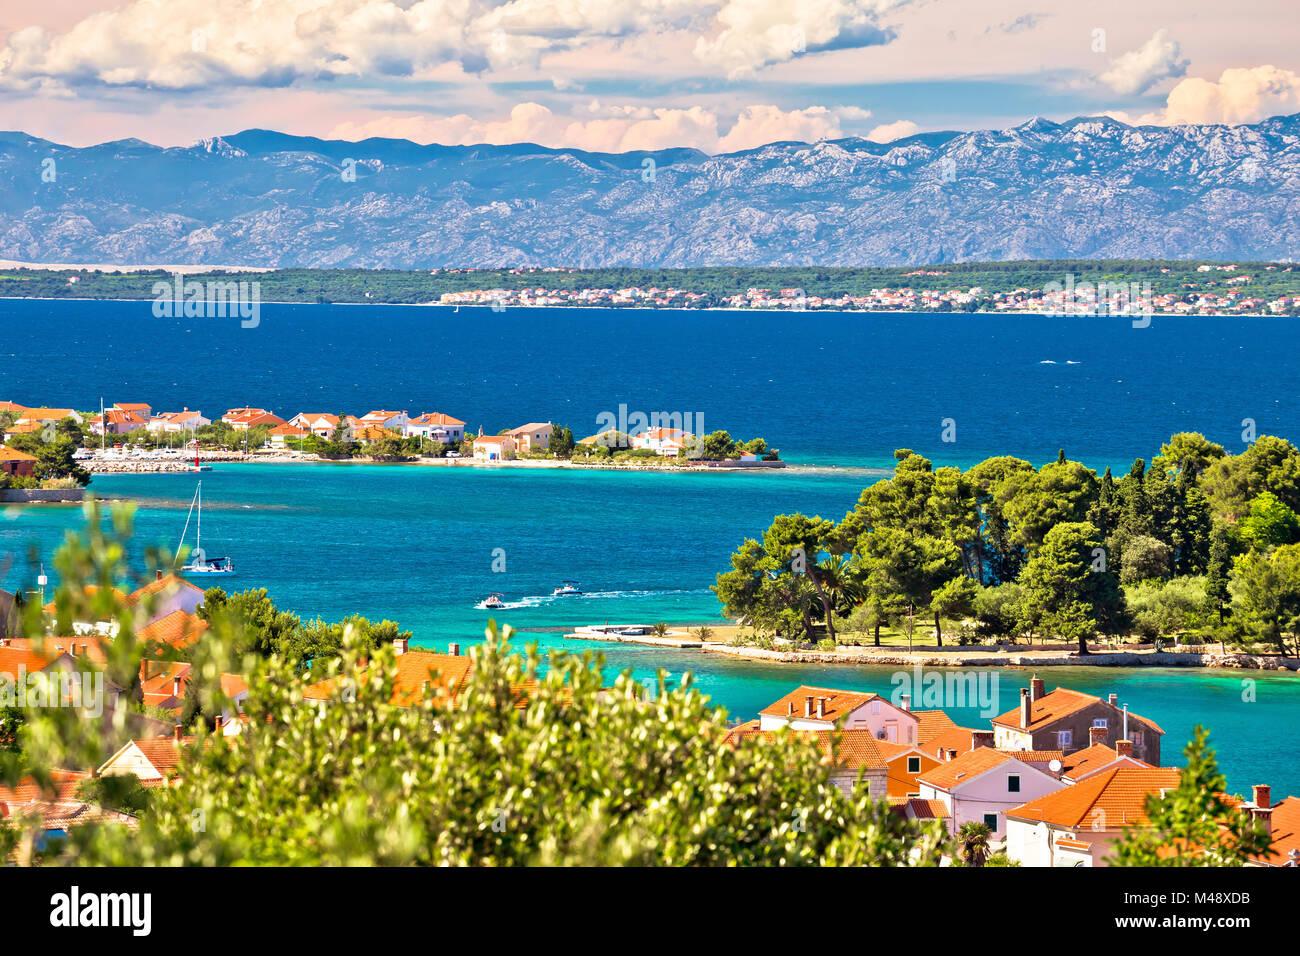 Zadar islands archipelago and Velebit mountain view Stock Photo